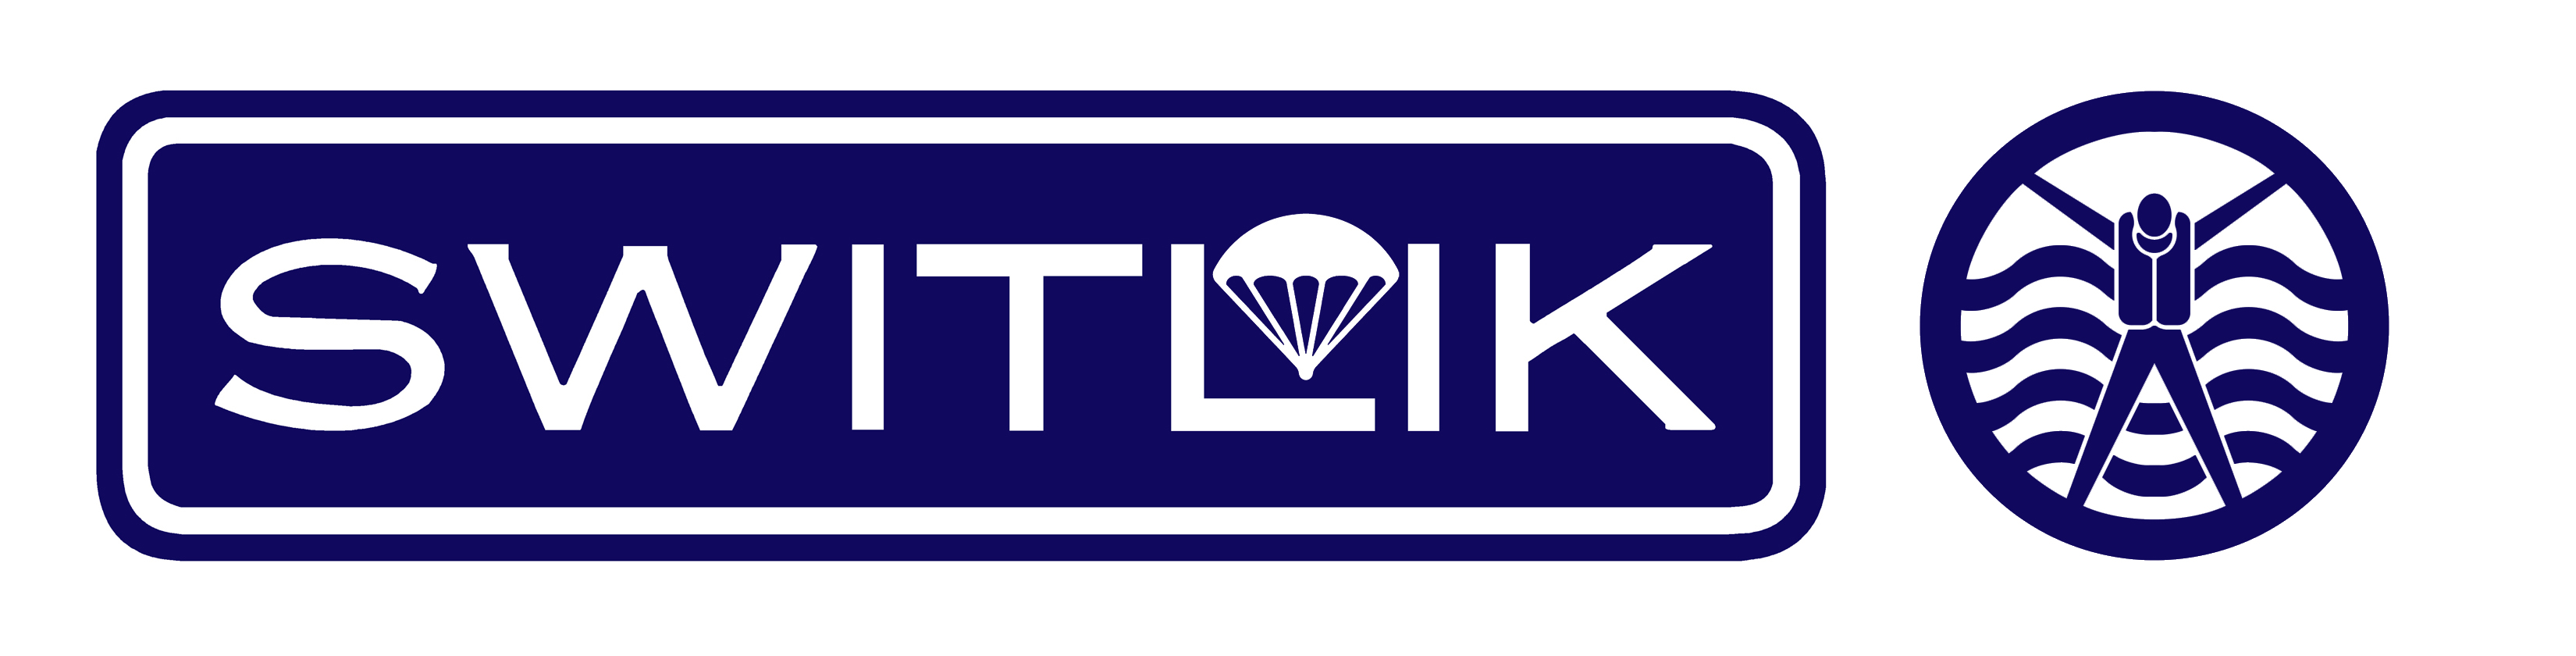 Switlik logo